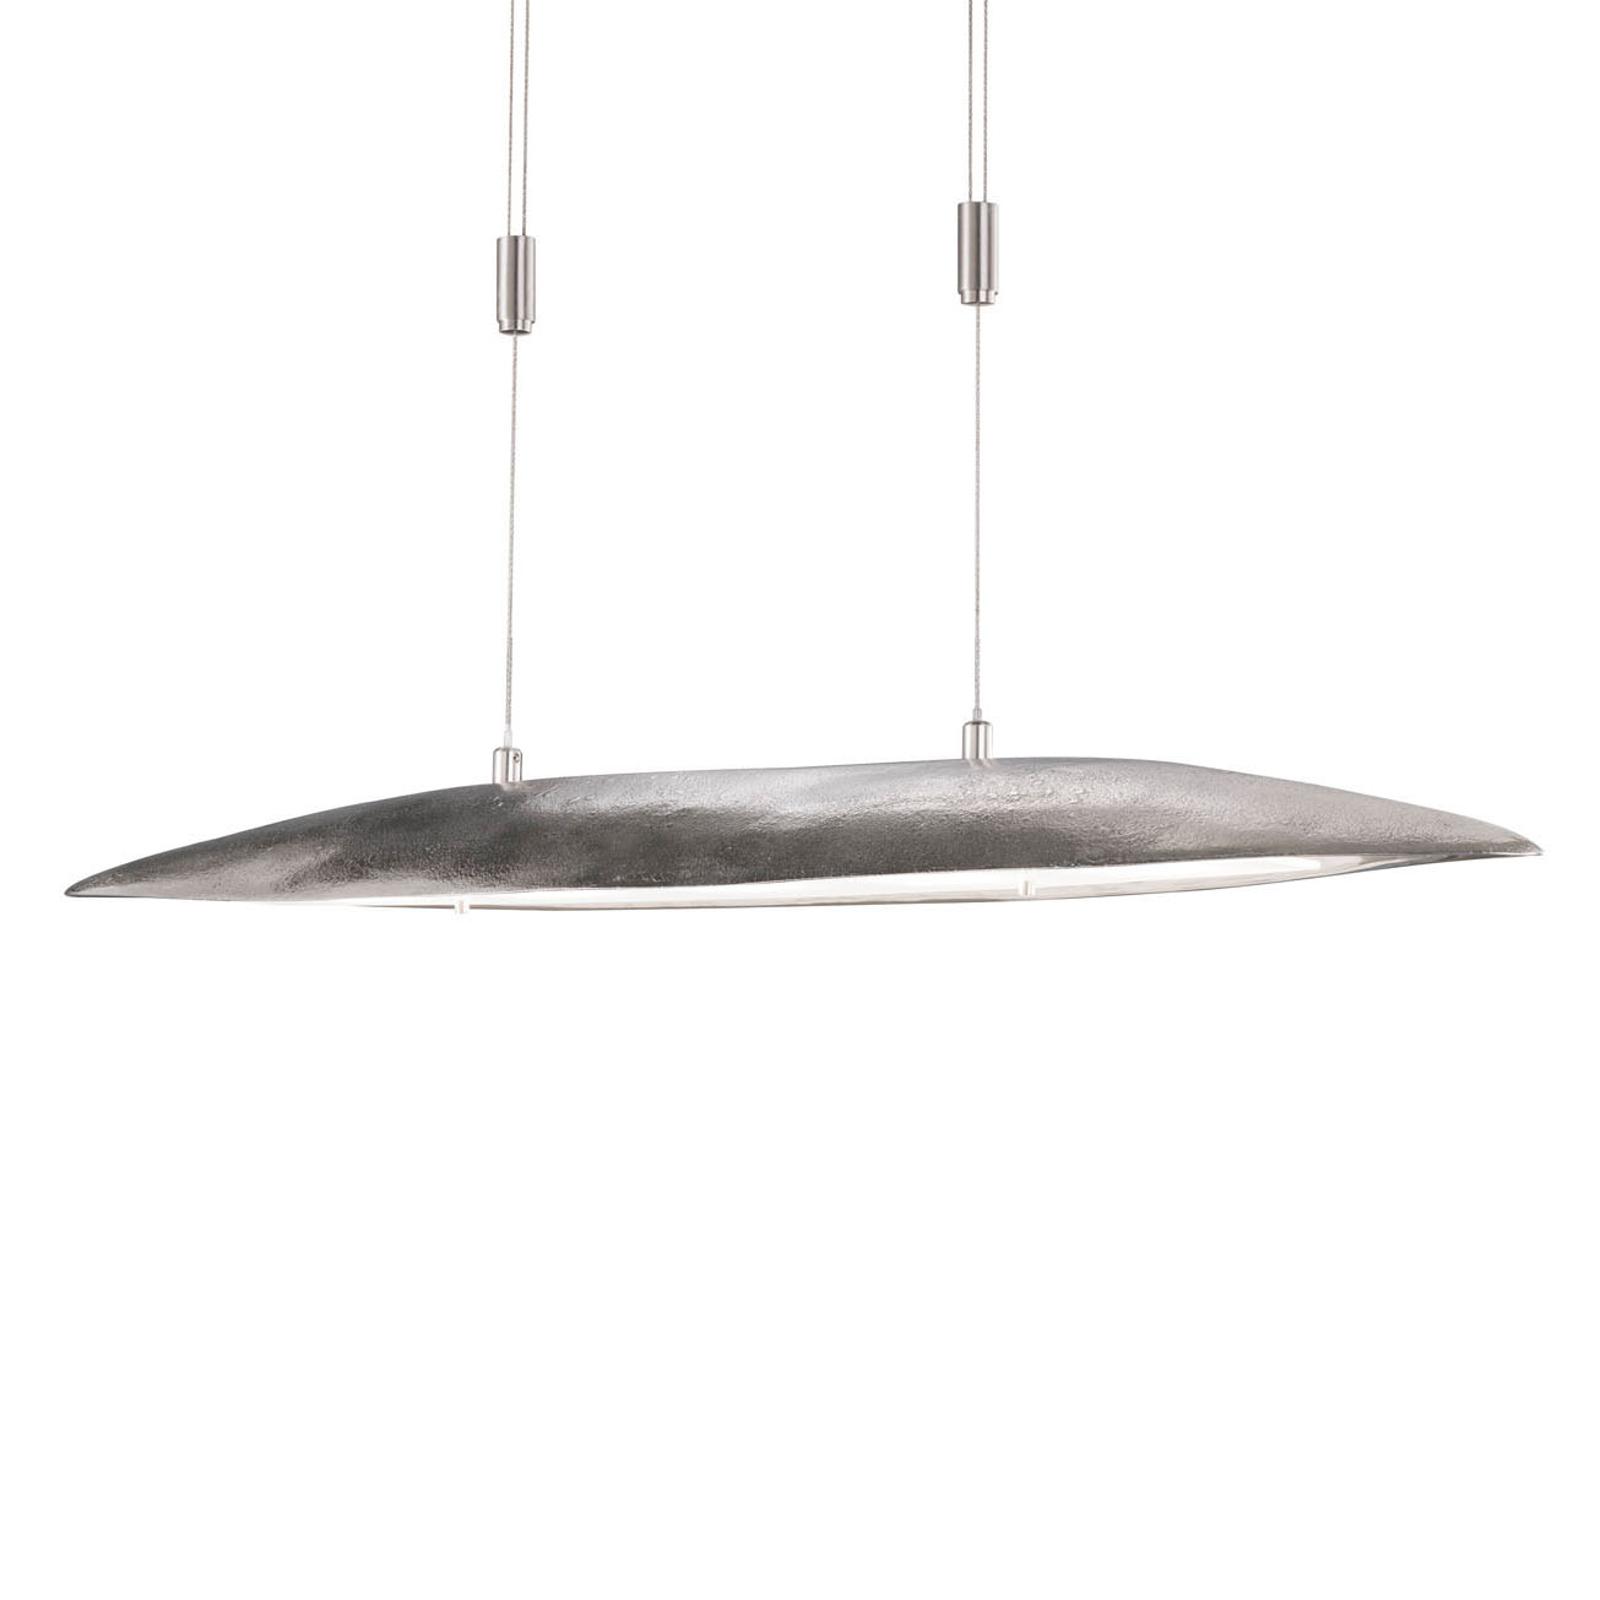 Lampada sospensione LED Colmar lunga 98 cm, nichel